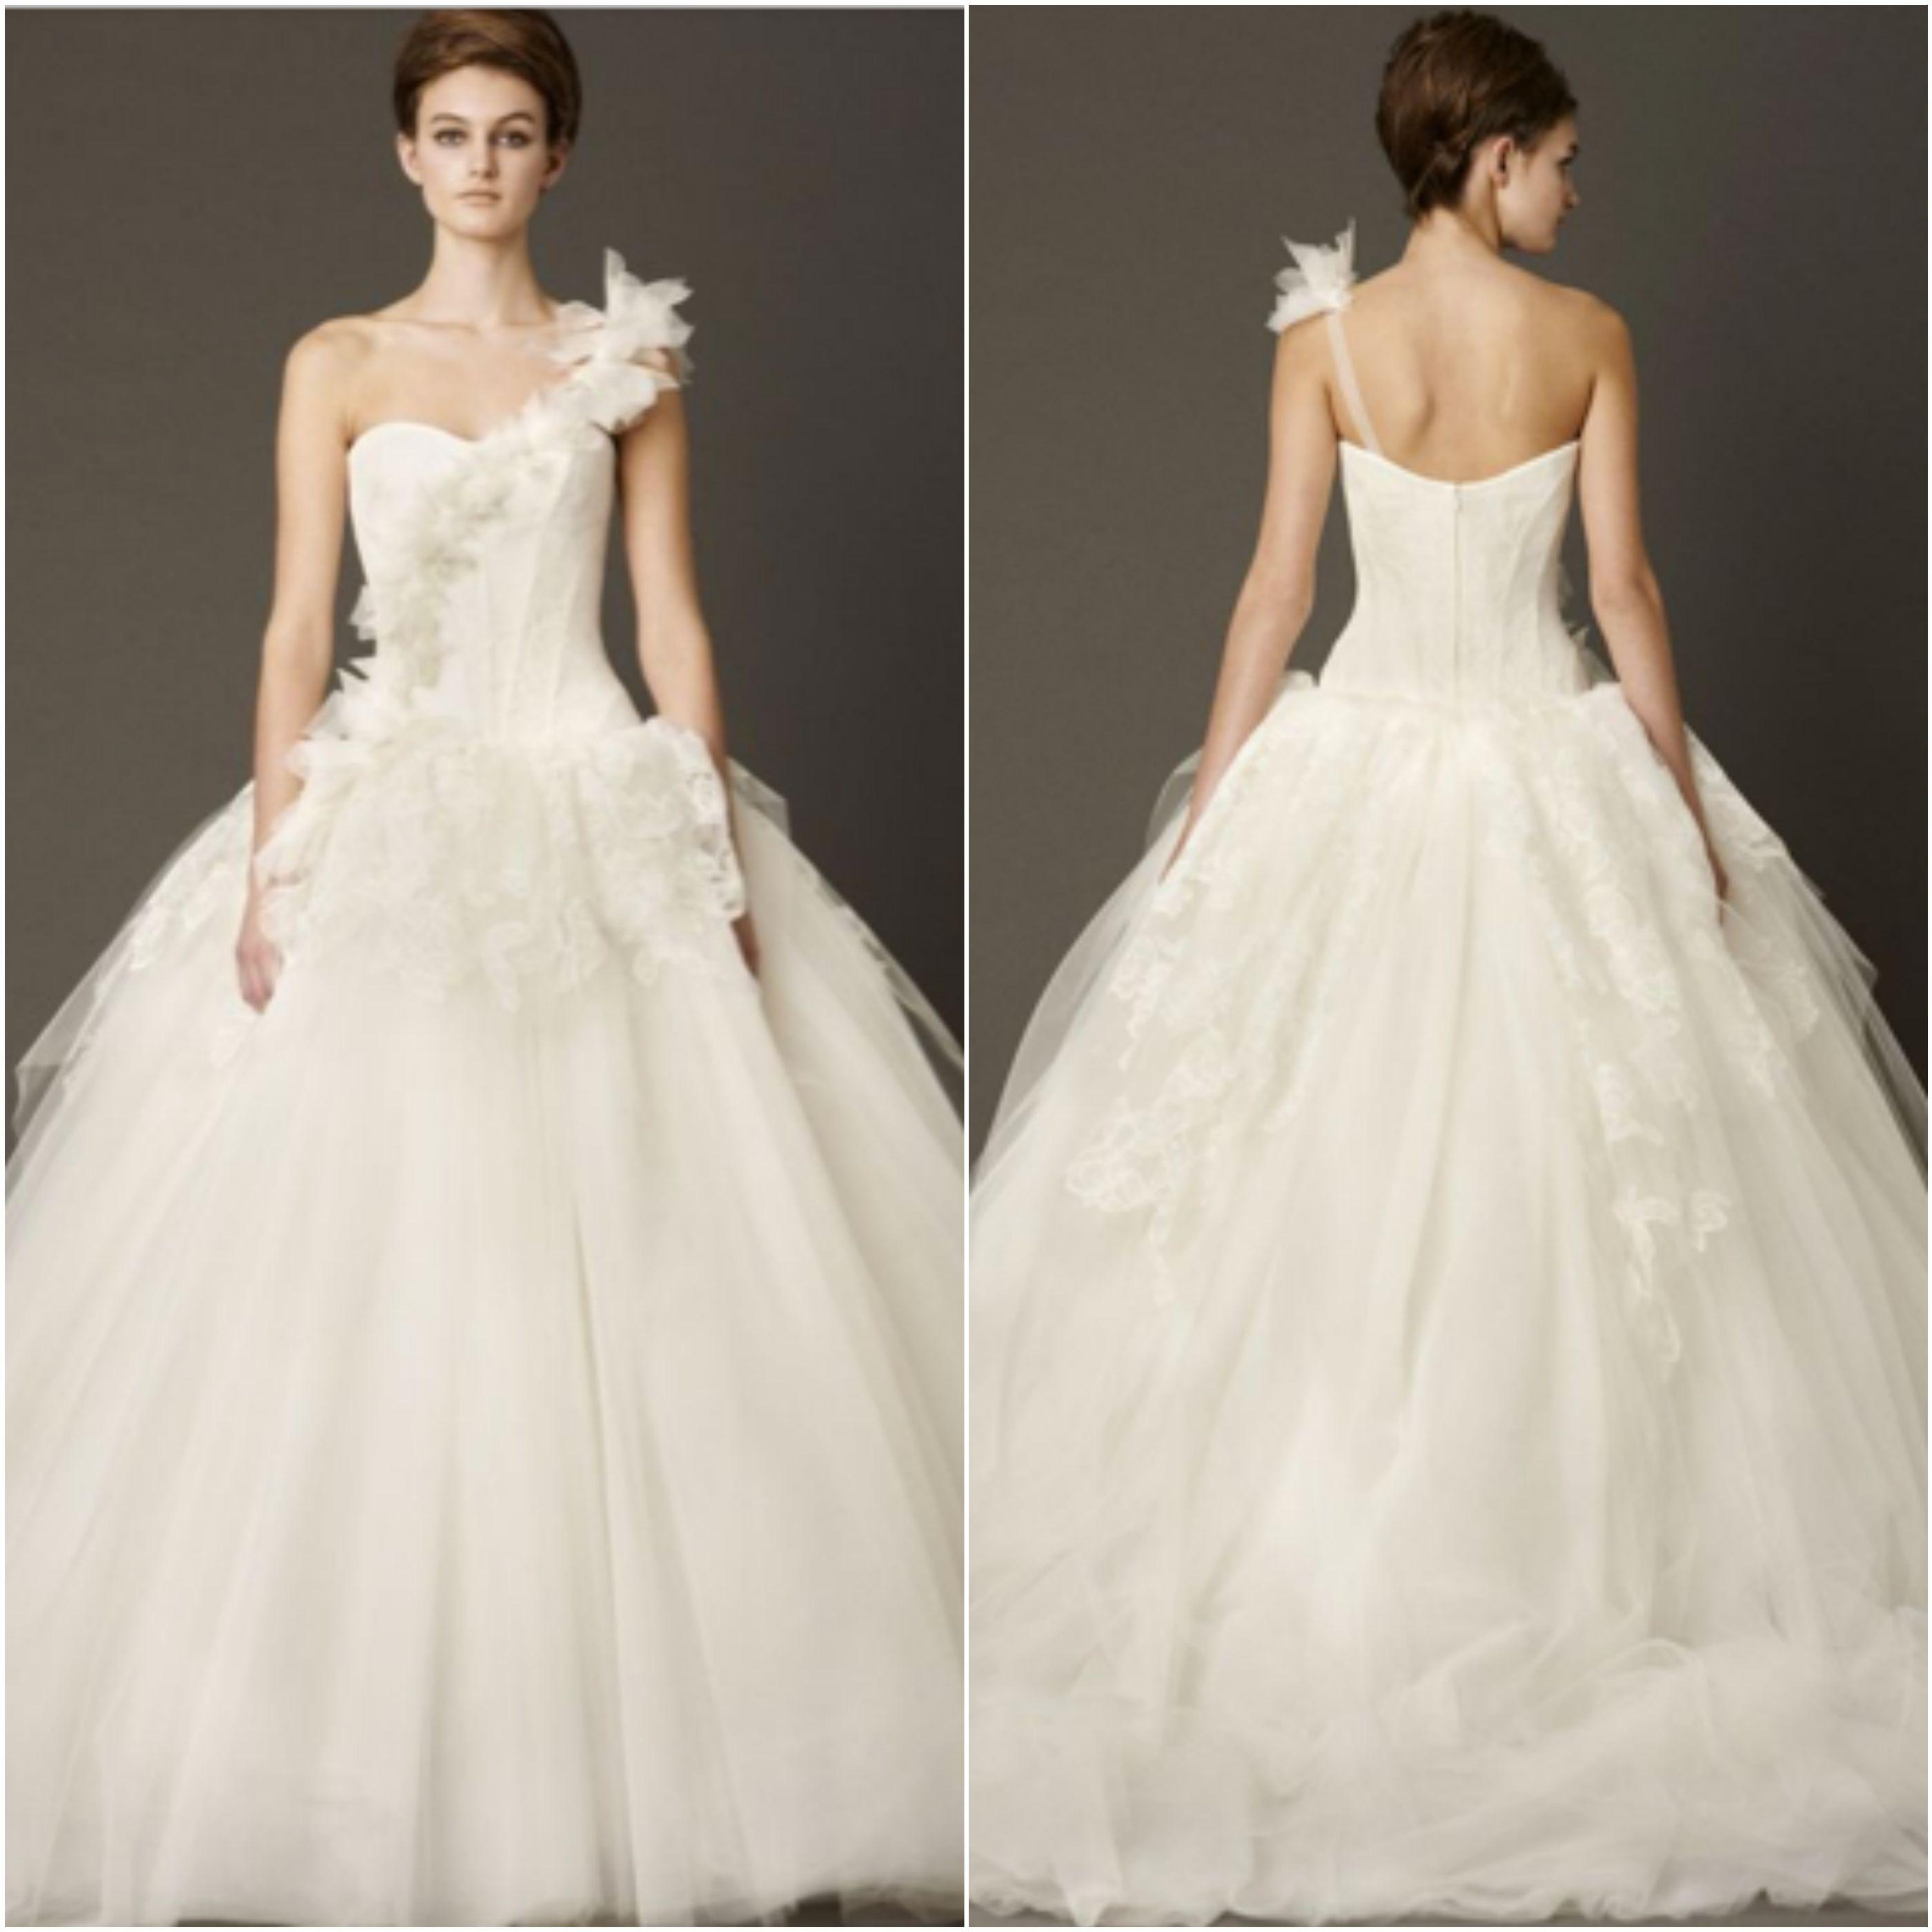 Vera Wang|Laura|Bridal Gown| Ballgown| b. Hughes Bridal Formal ...